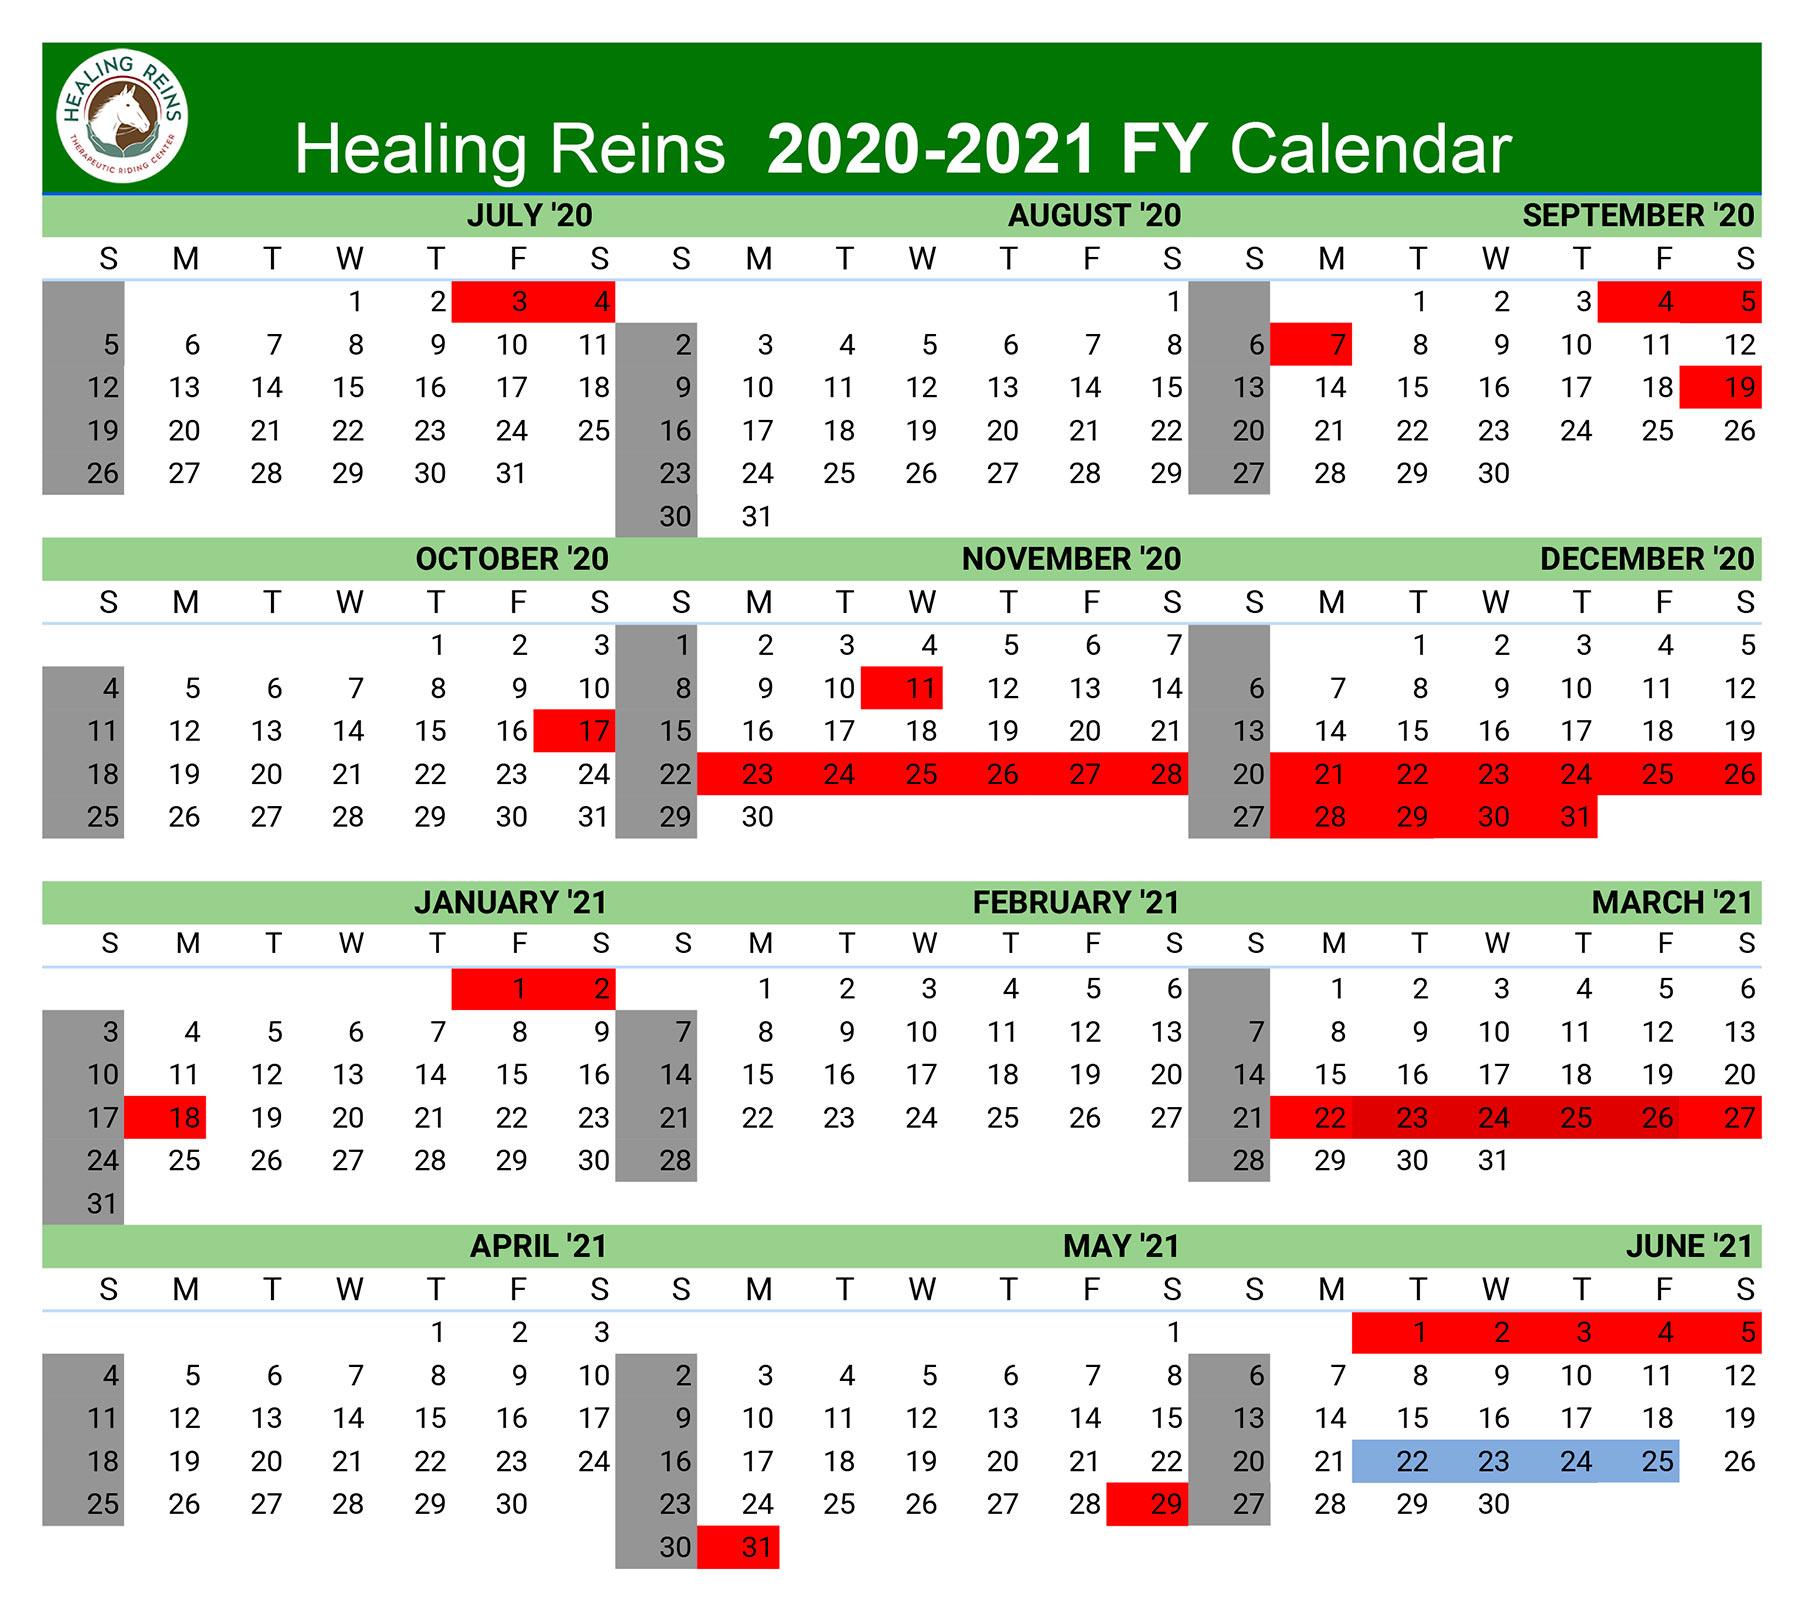 2020-2021 annual calendar for healing reins